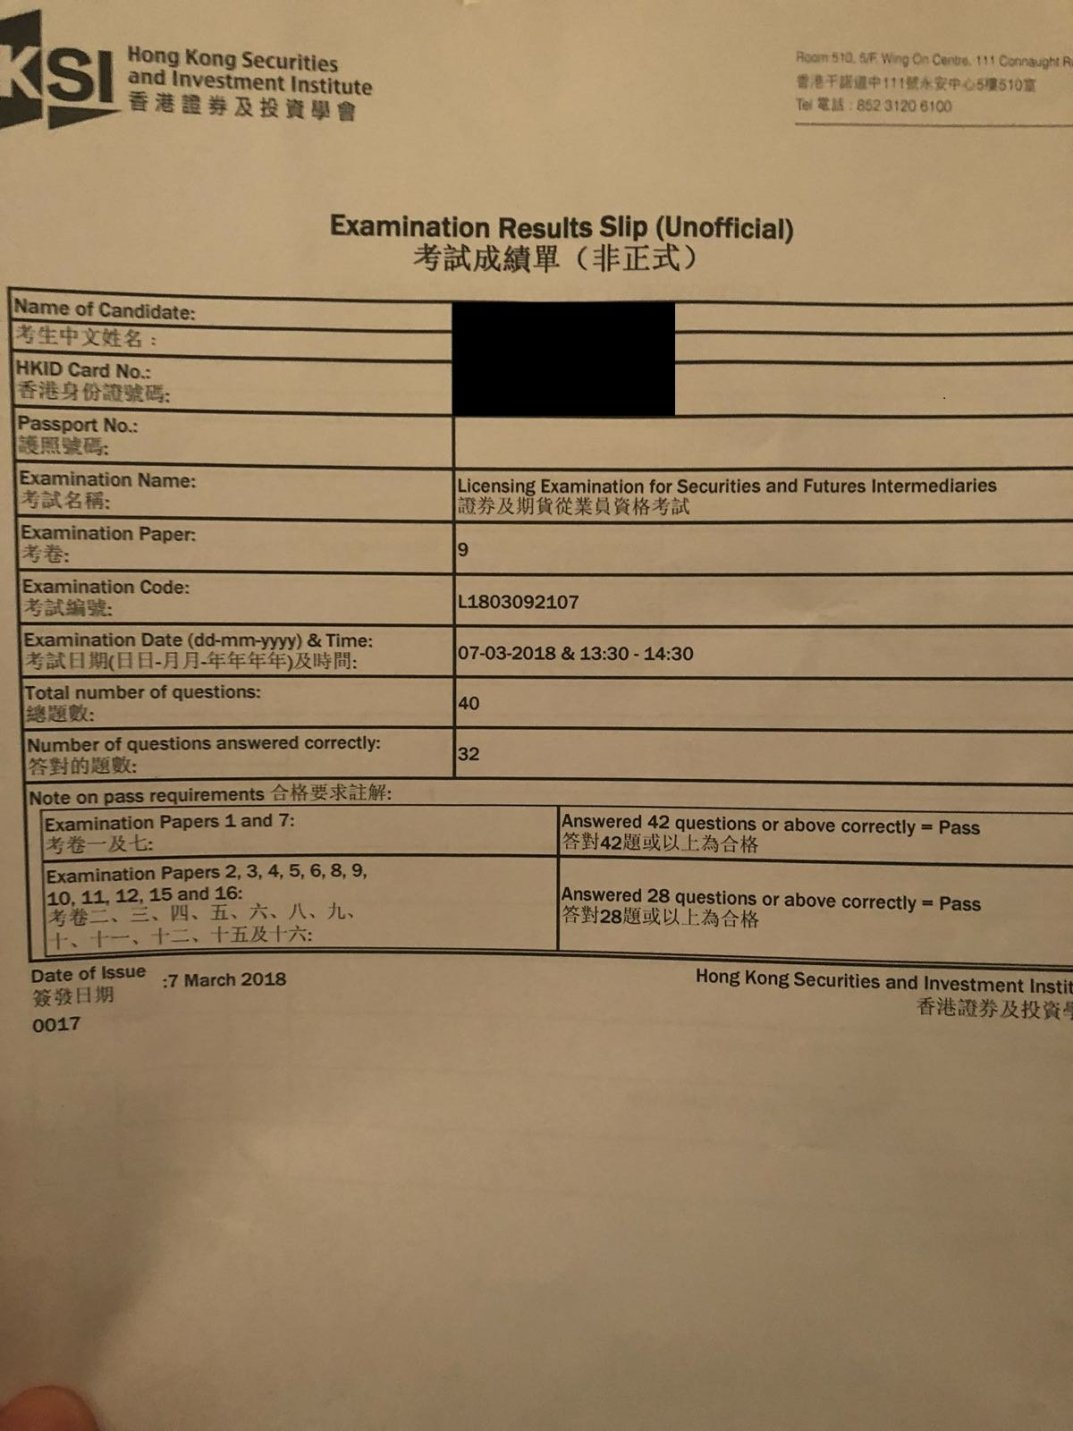 JH 7/3/2018 LE Paper 9 證券期貨從業員資格考試卷九 Pass